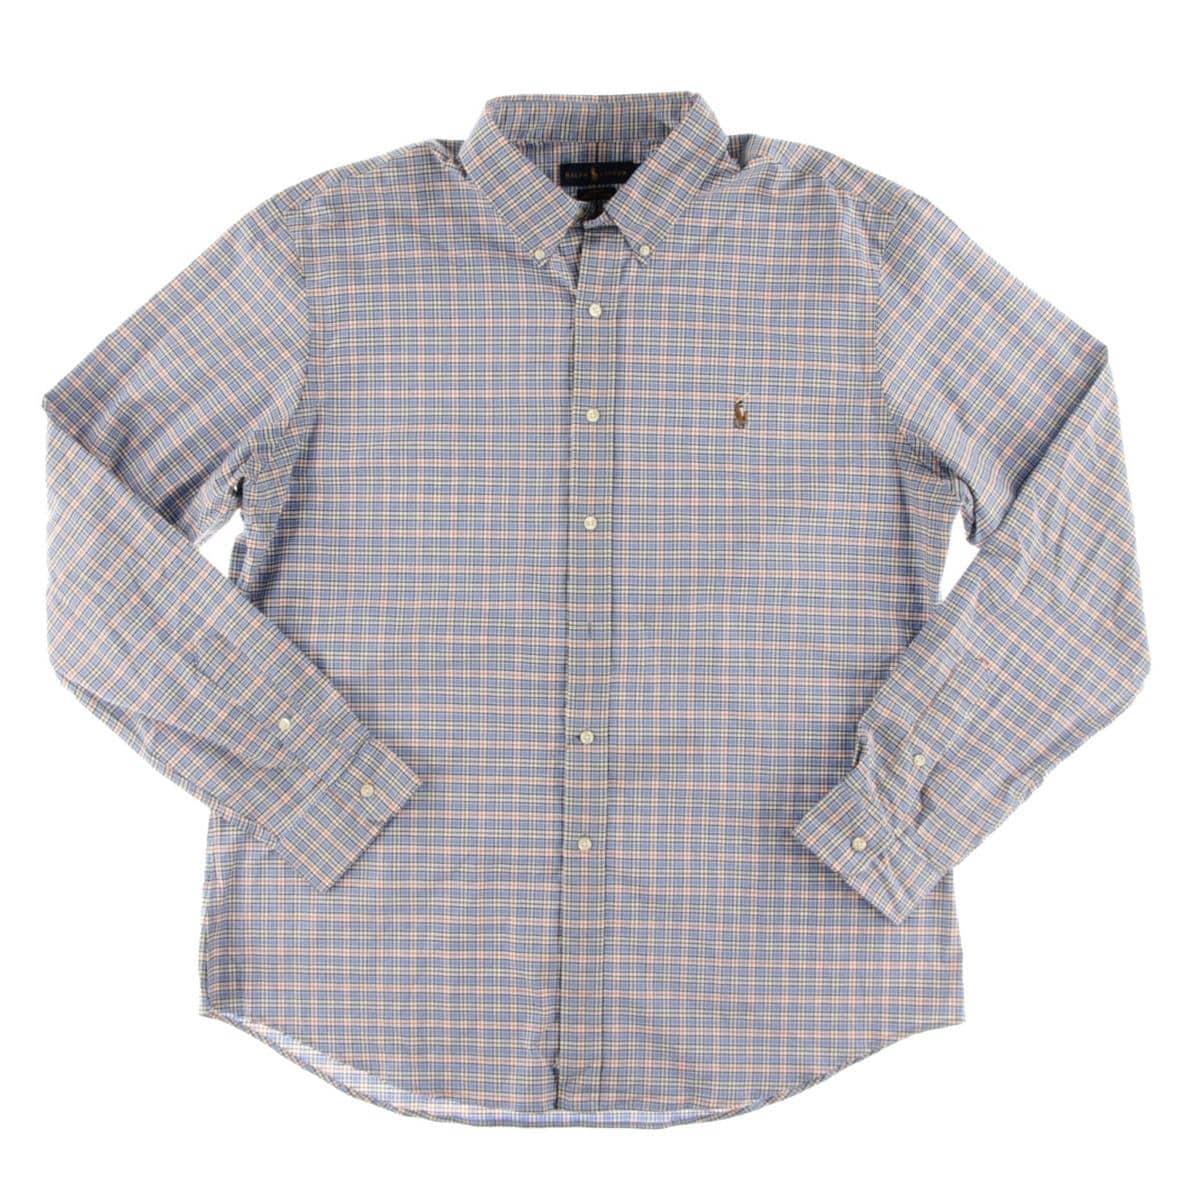 Shop Ralph Lauren Mens Button Down Shirt Plaid Monogrammed Free